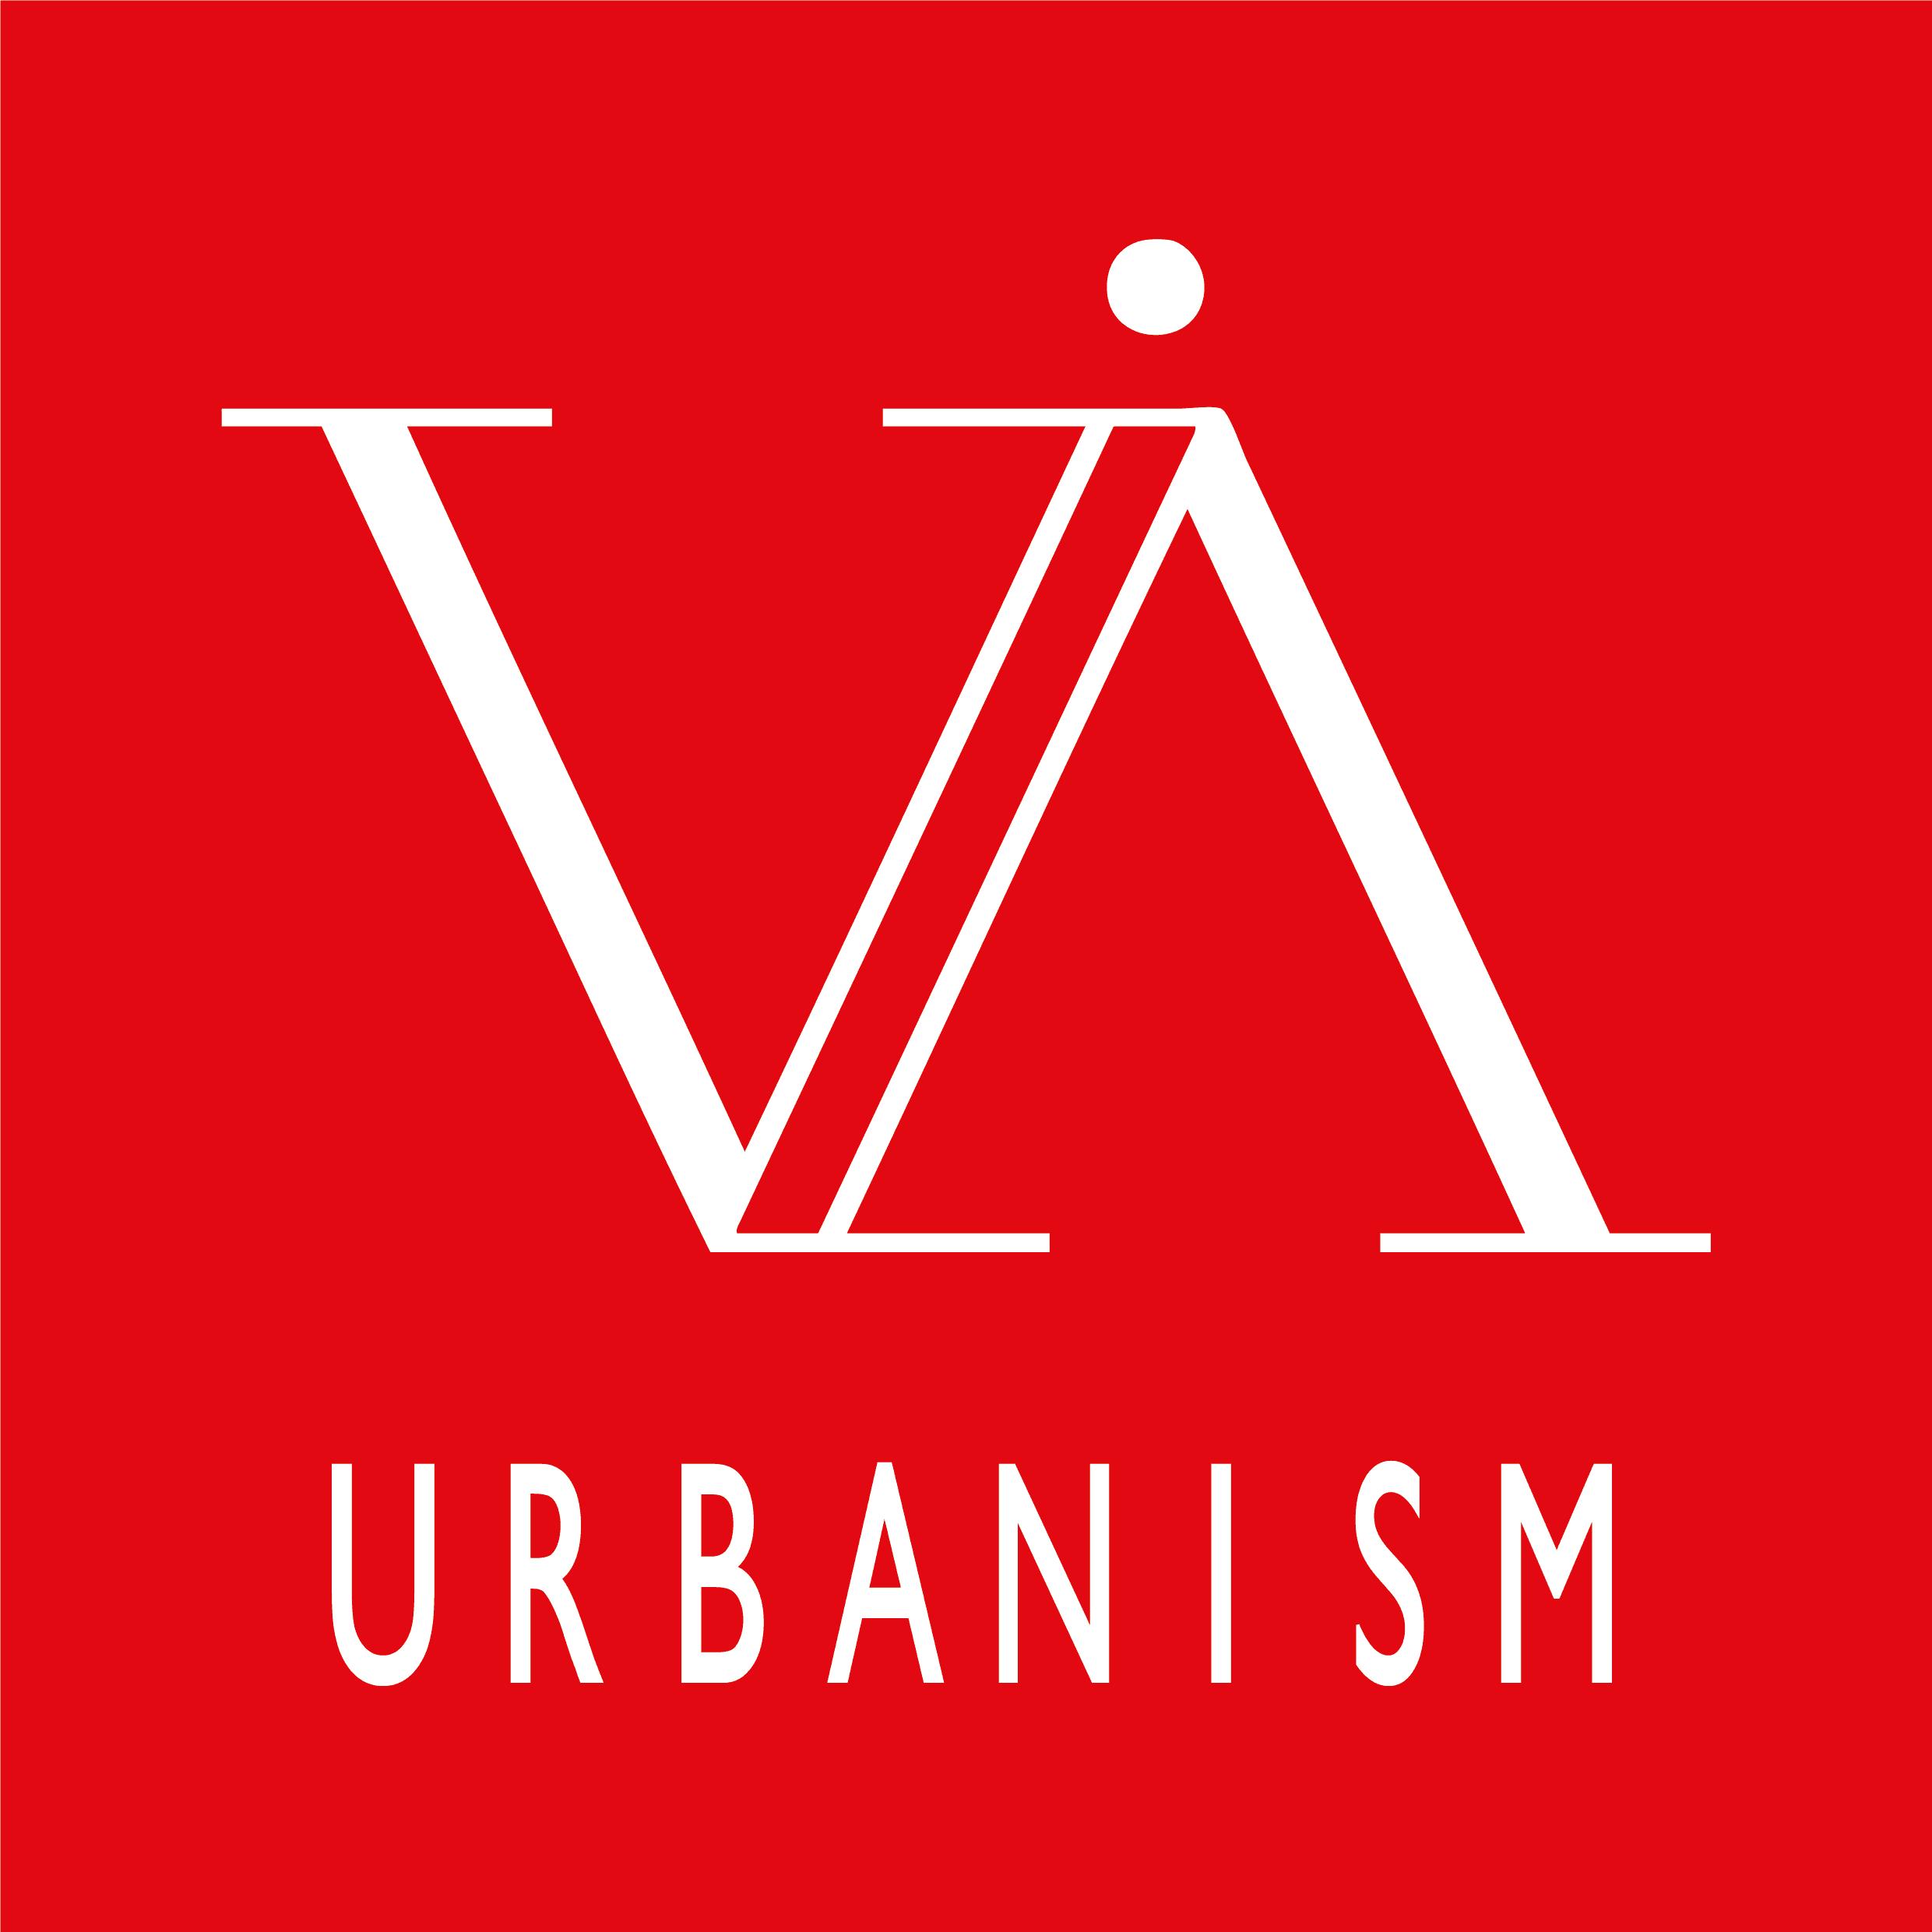 VIA Urbanism